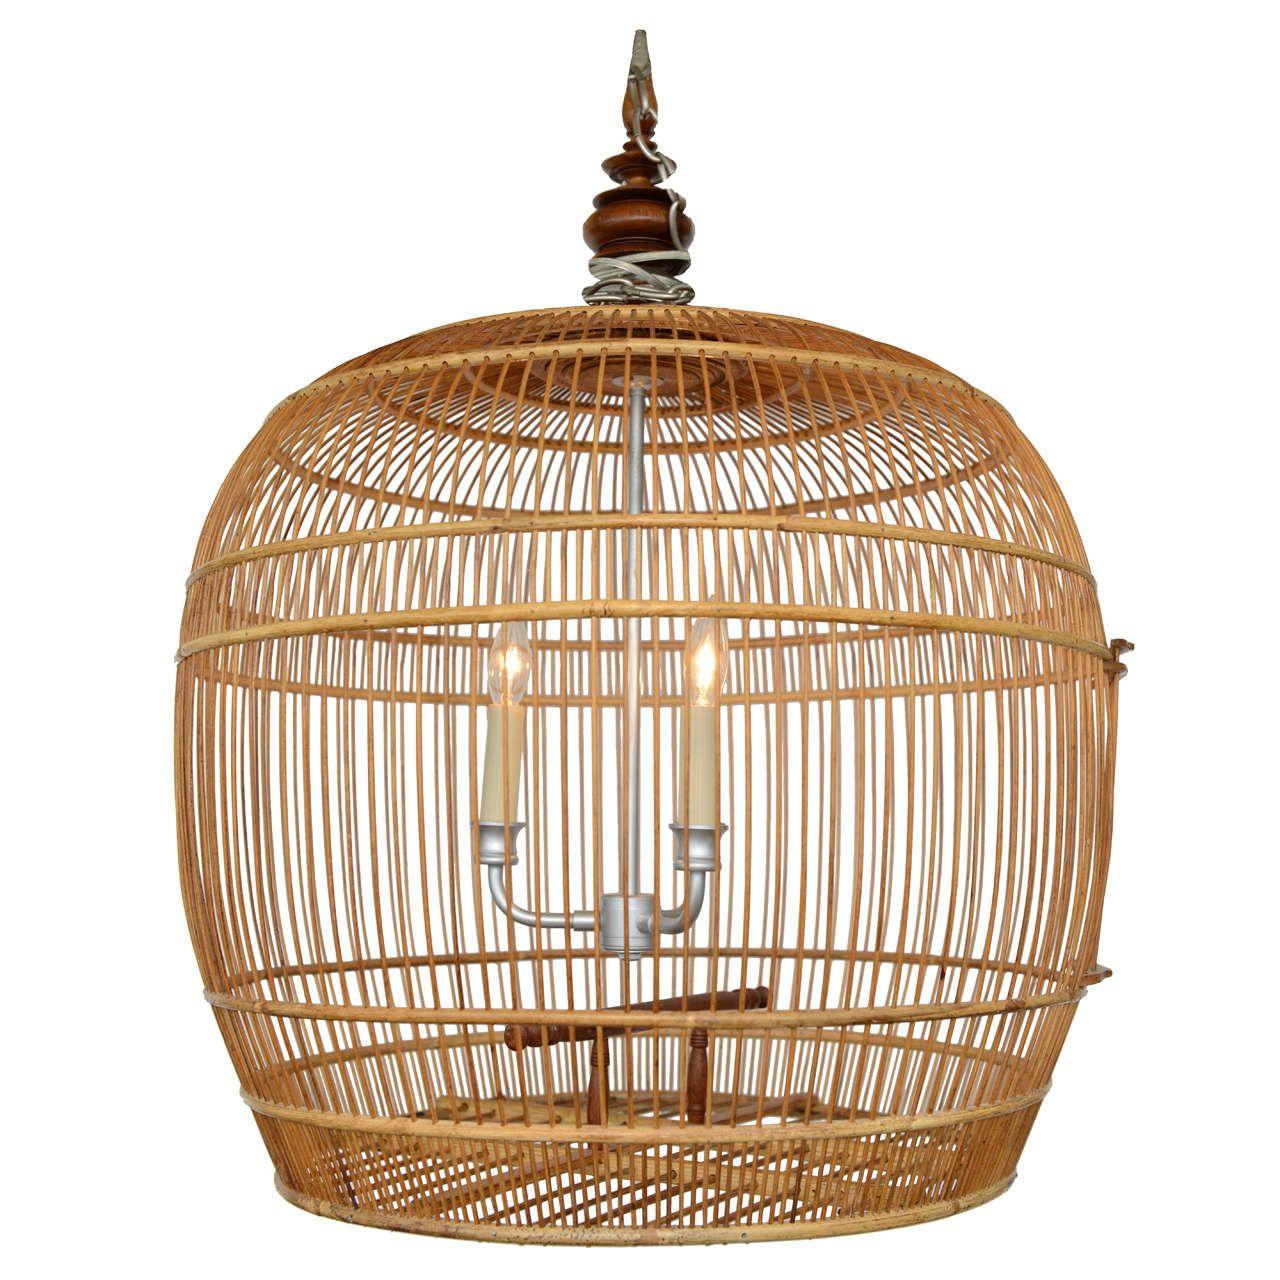 Fabulous bird cage bamboo chandelier bird cages and chandeliers fabulous bird cage bamboo chandelier arubaitofo Image collections